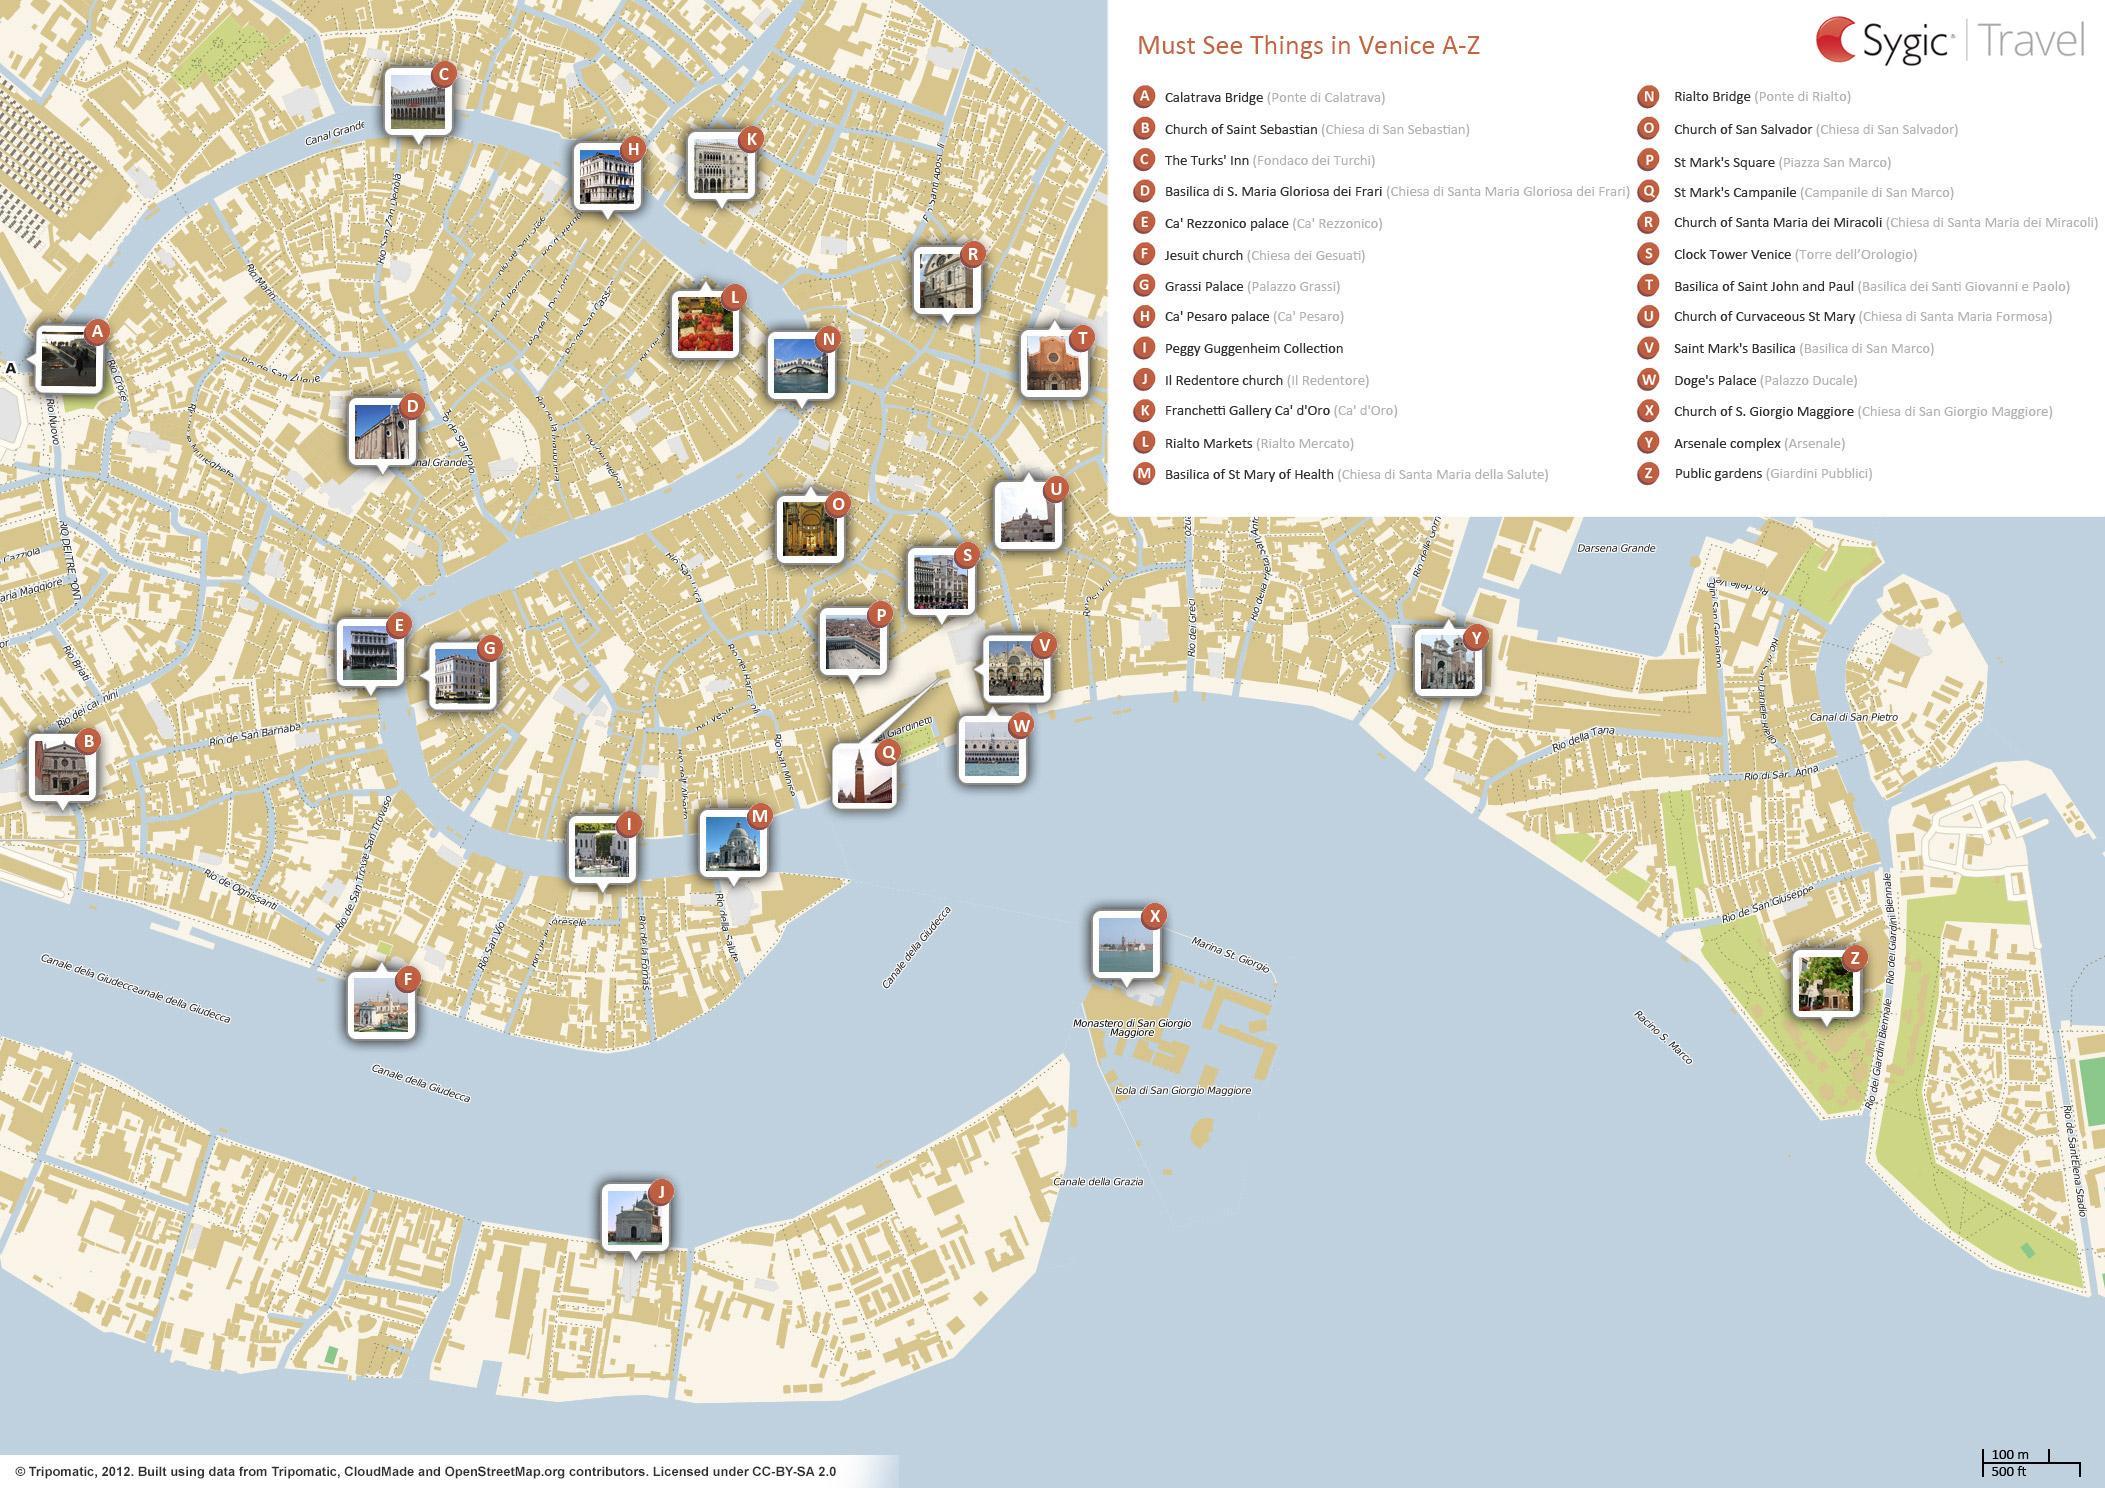 Venice sightseeing map - Venezia sightseeing map (Italy)